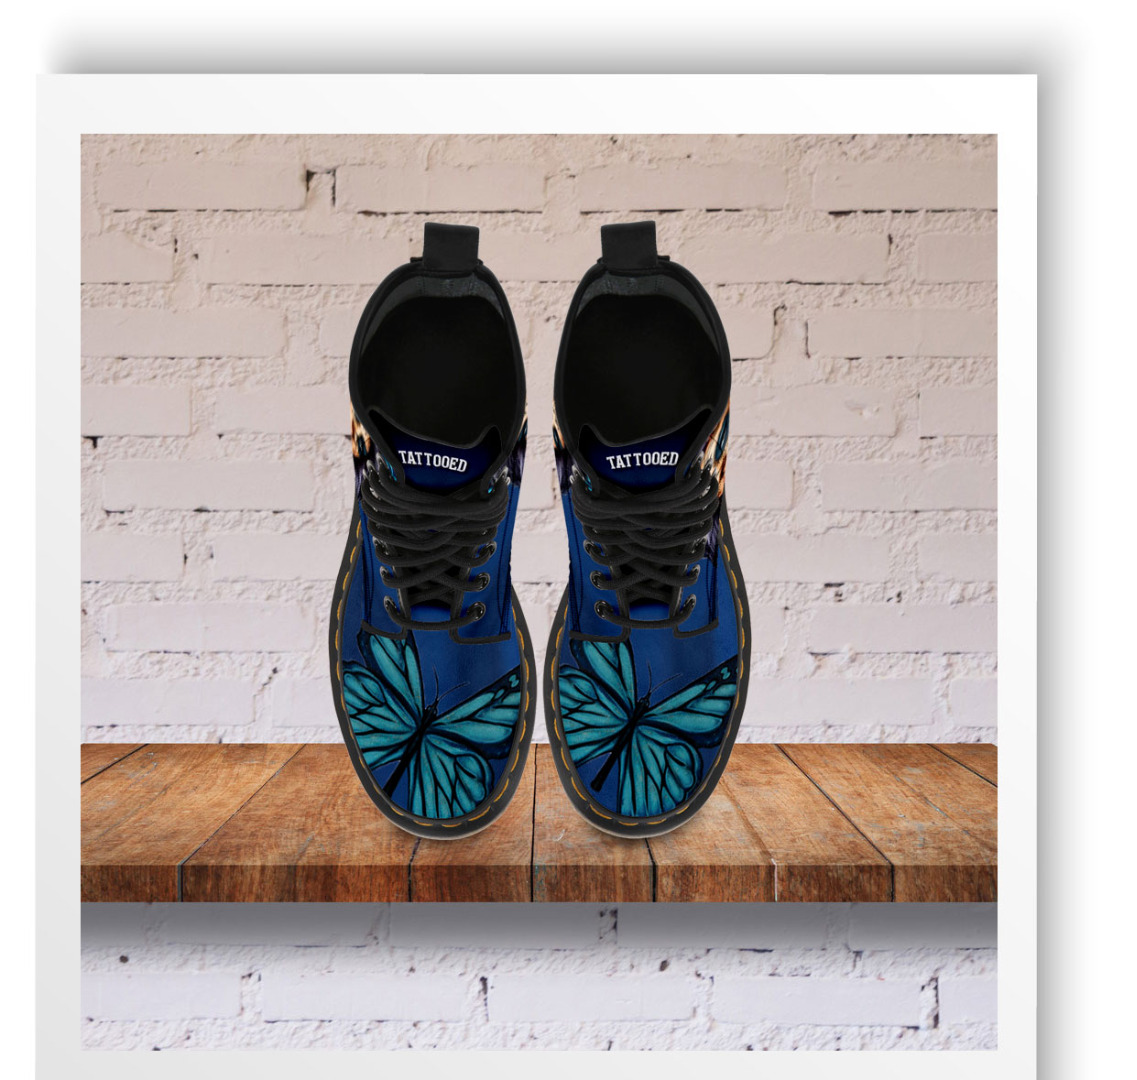 Tattooed Shoes